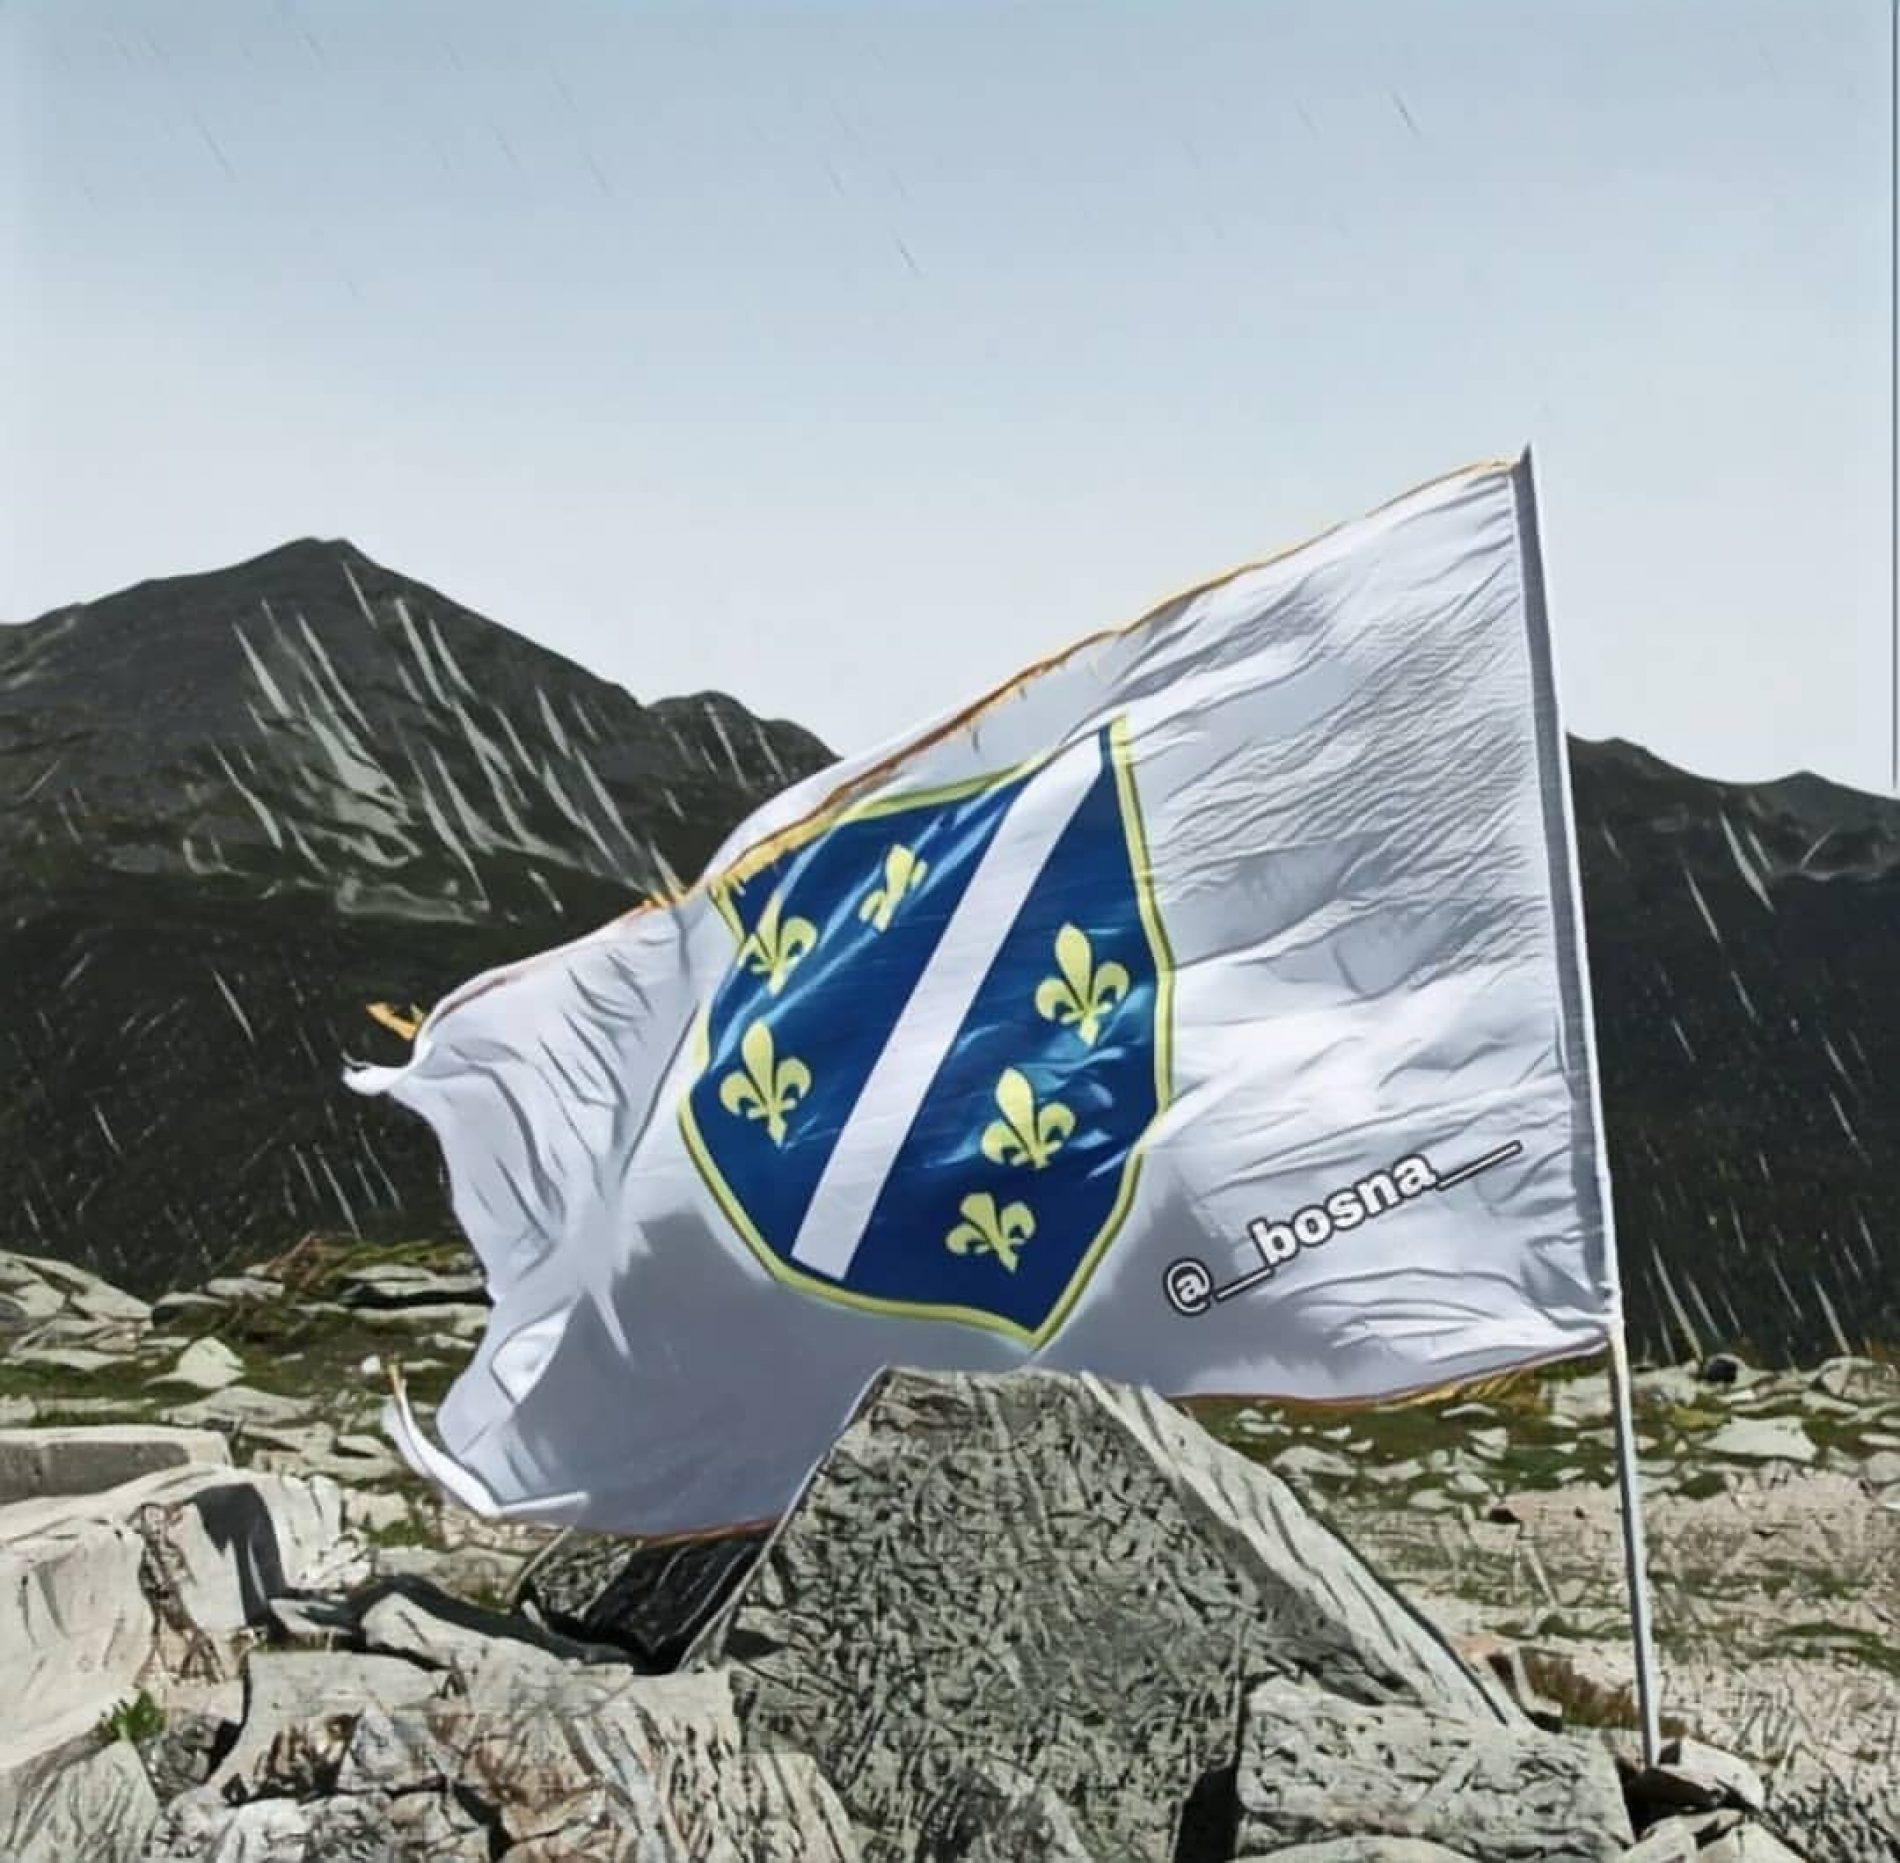 Koliko držimo do slavne bosanske prošlosti? Četiri datuma koji zaslužuju adekvatno obilježavanje